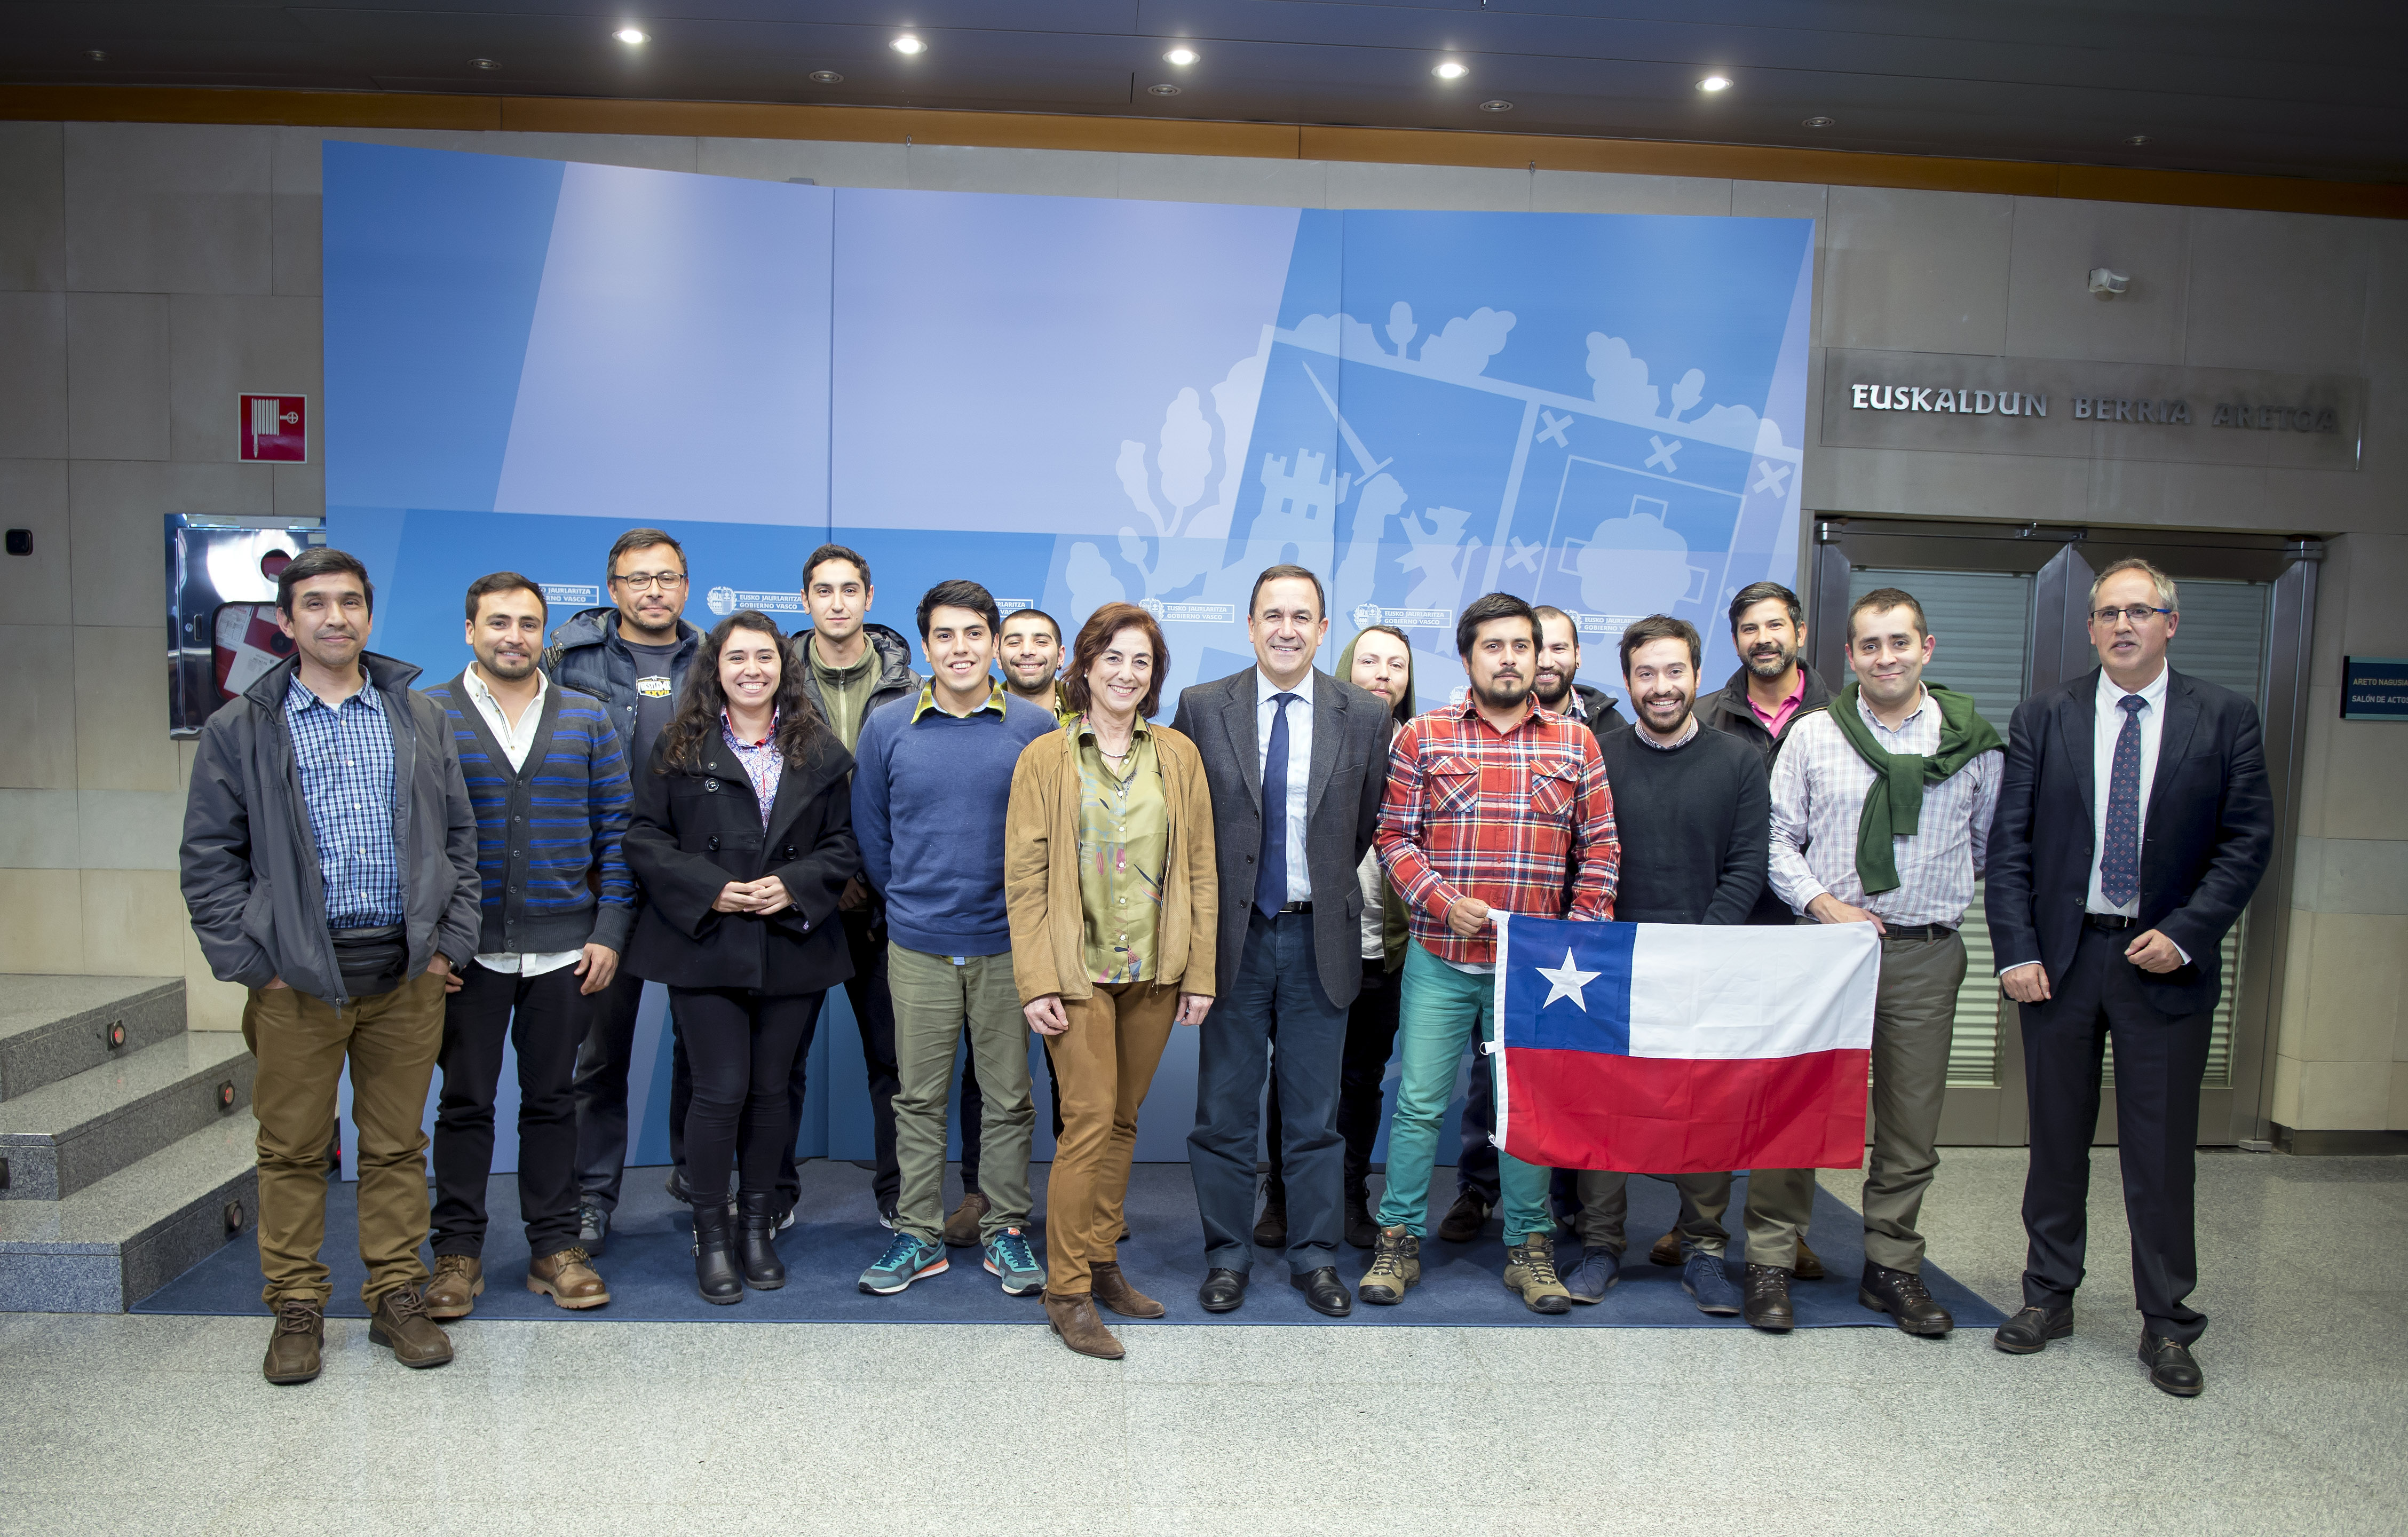 2017_02_20_uriarte_chilenos_fp_09.jpg